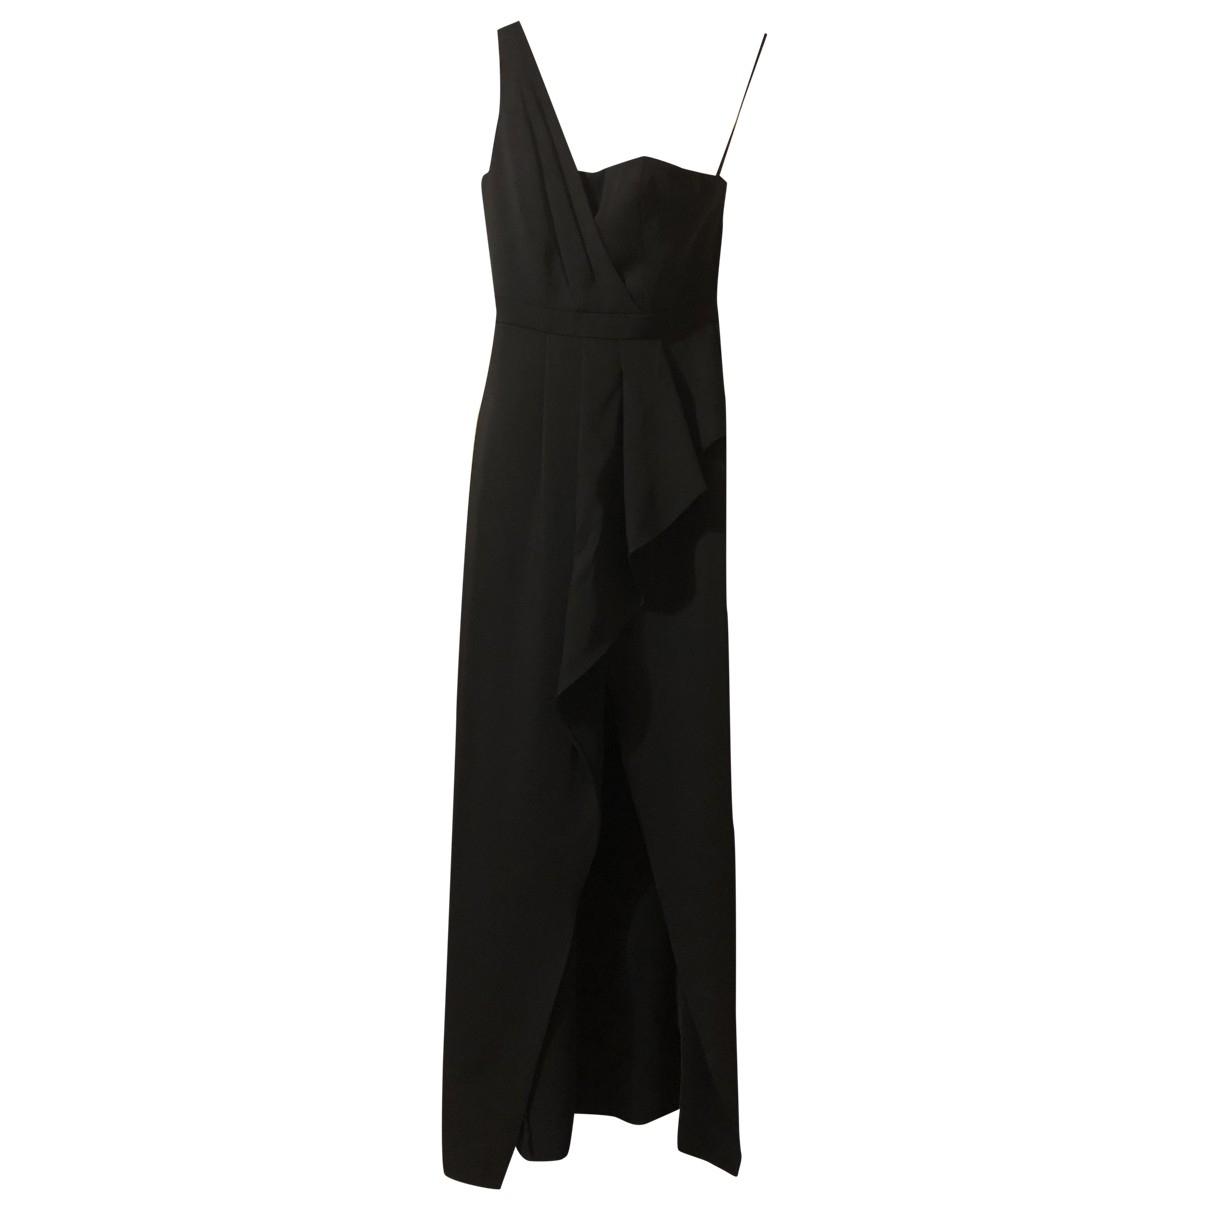 Bcbg Max Azria \N Black dress for Women 4 US